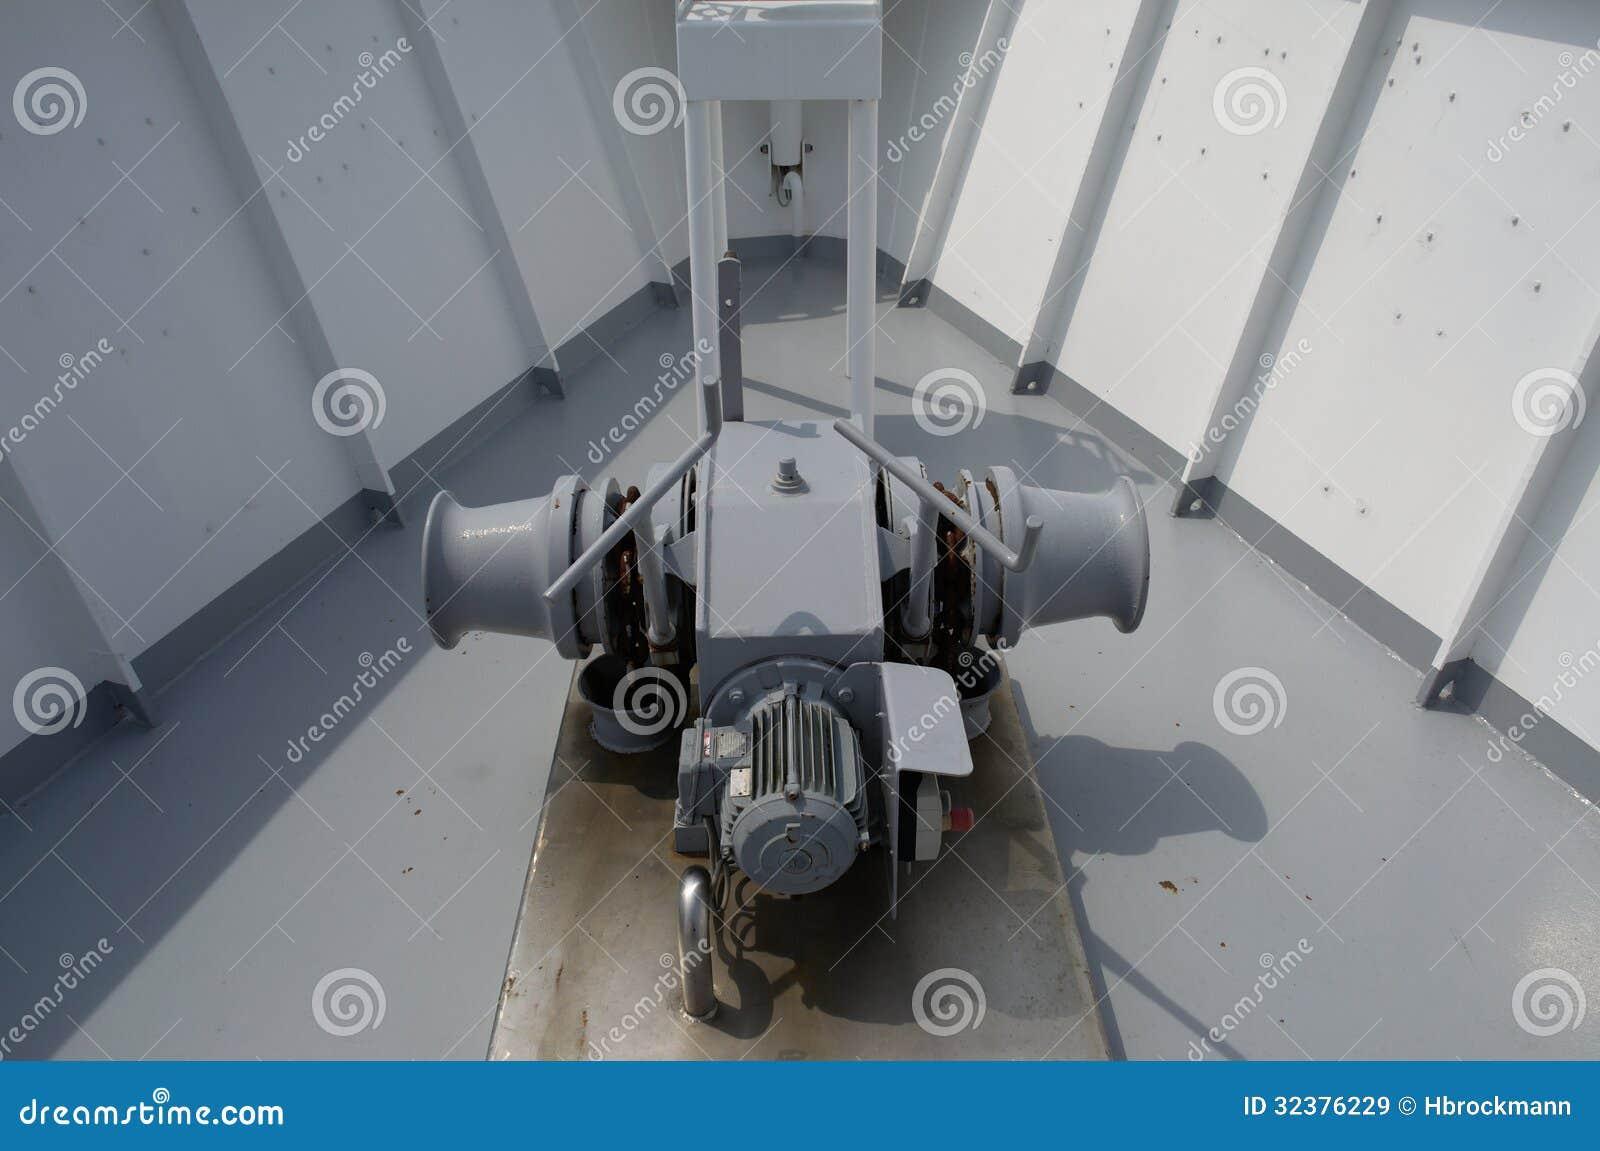 Anchor Windlass Of A Passenger Ship Royalty Free Stock Images - Image: 32376229